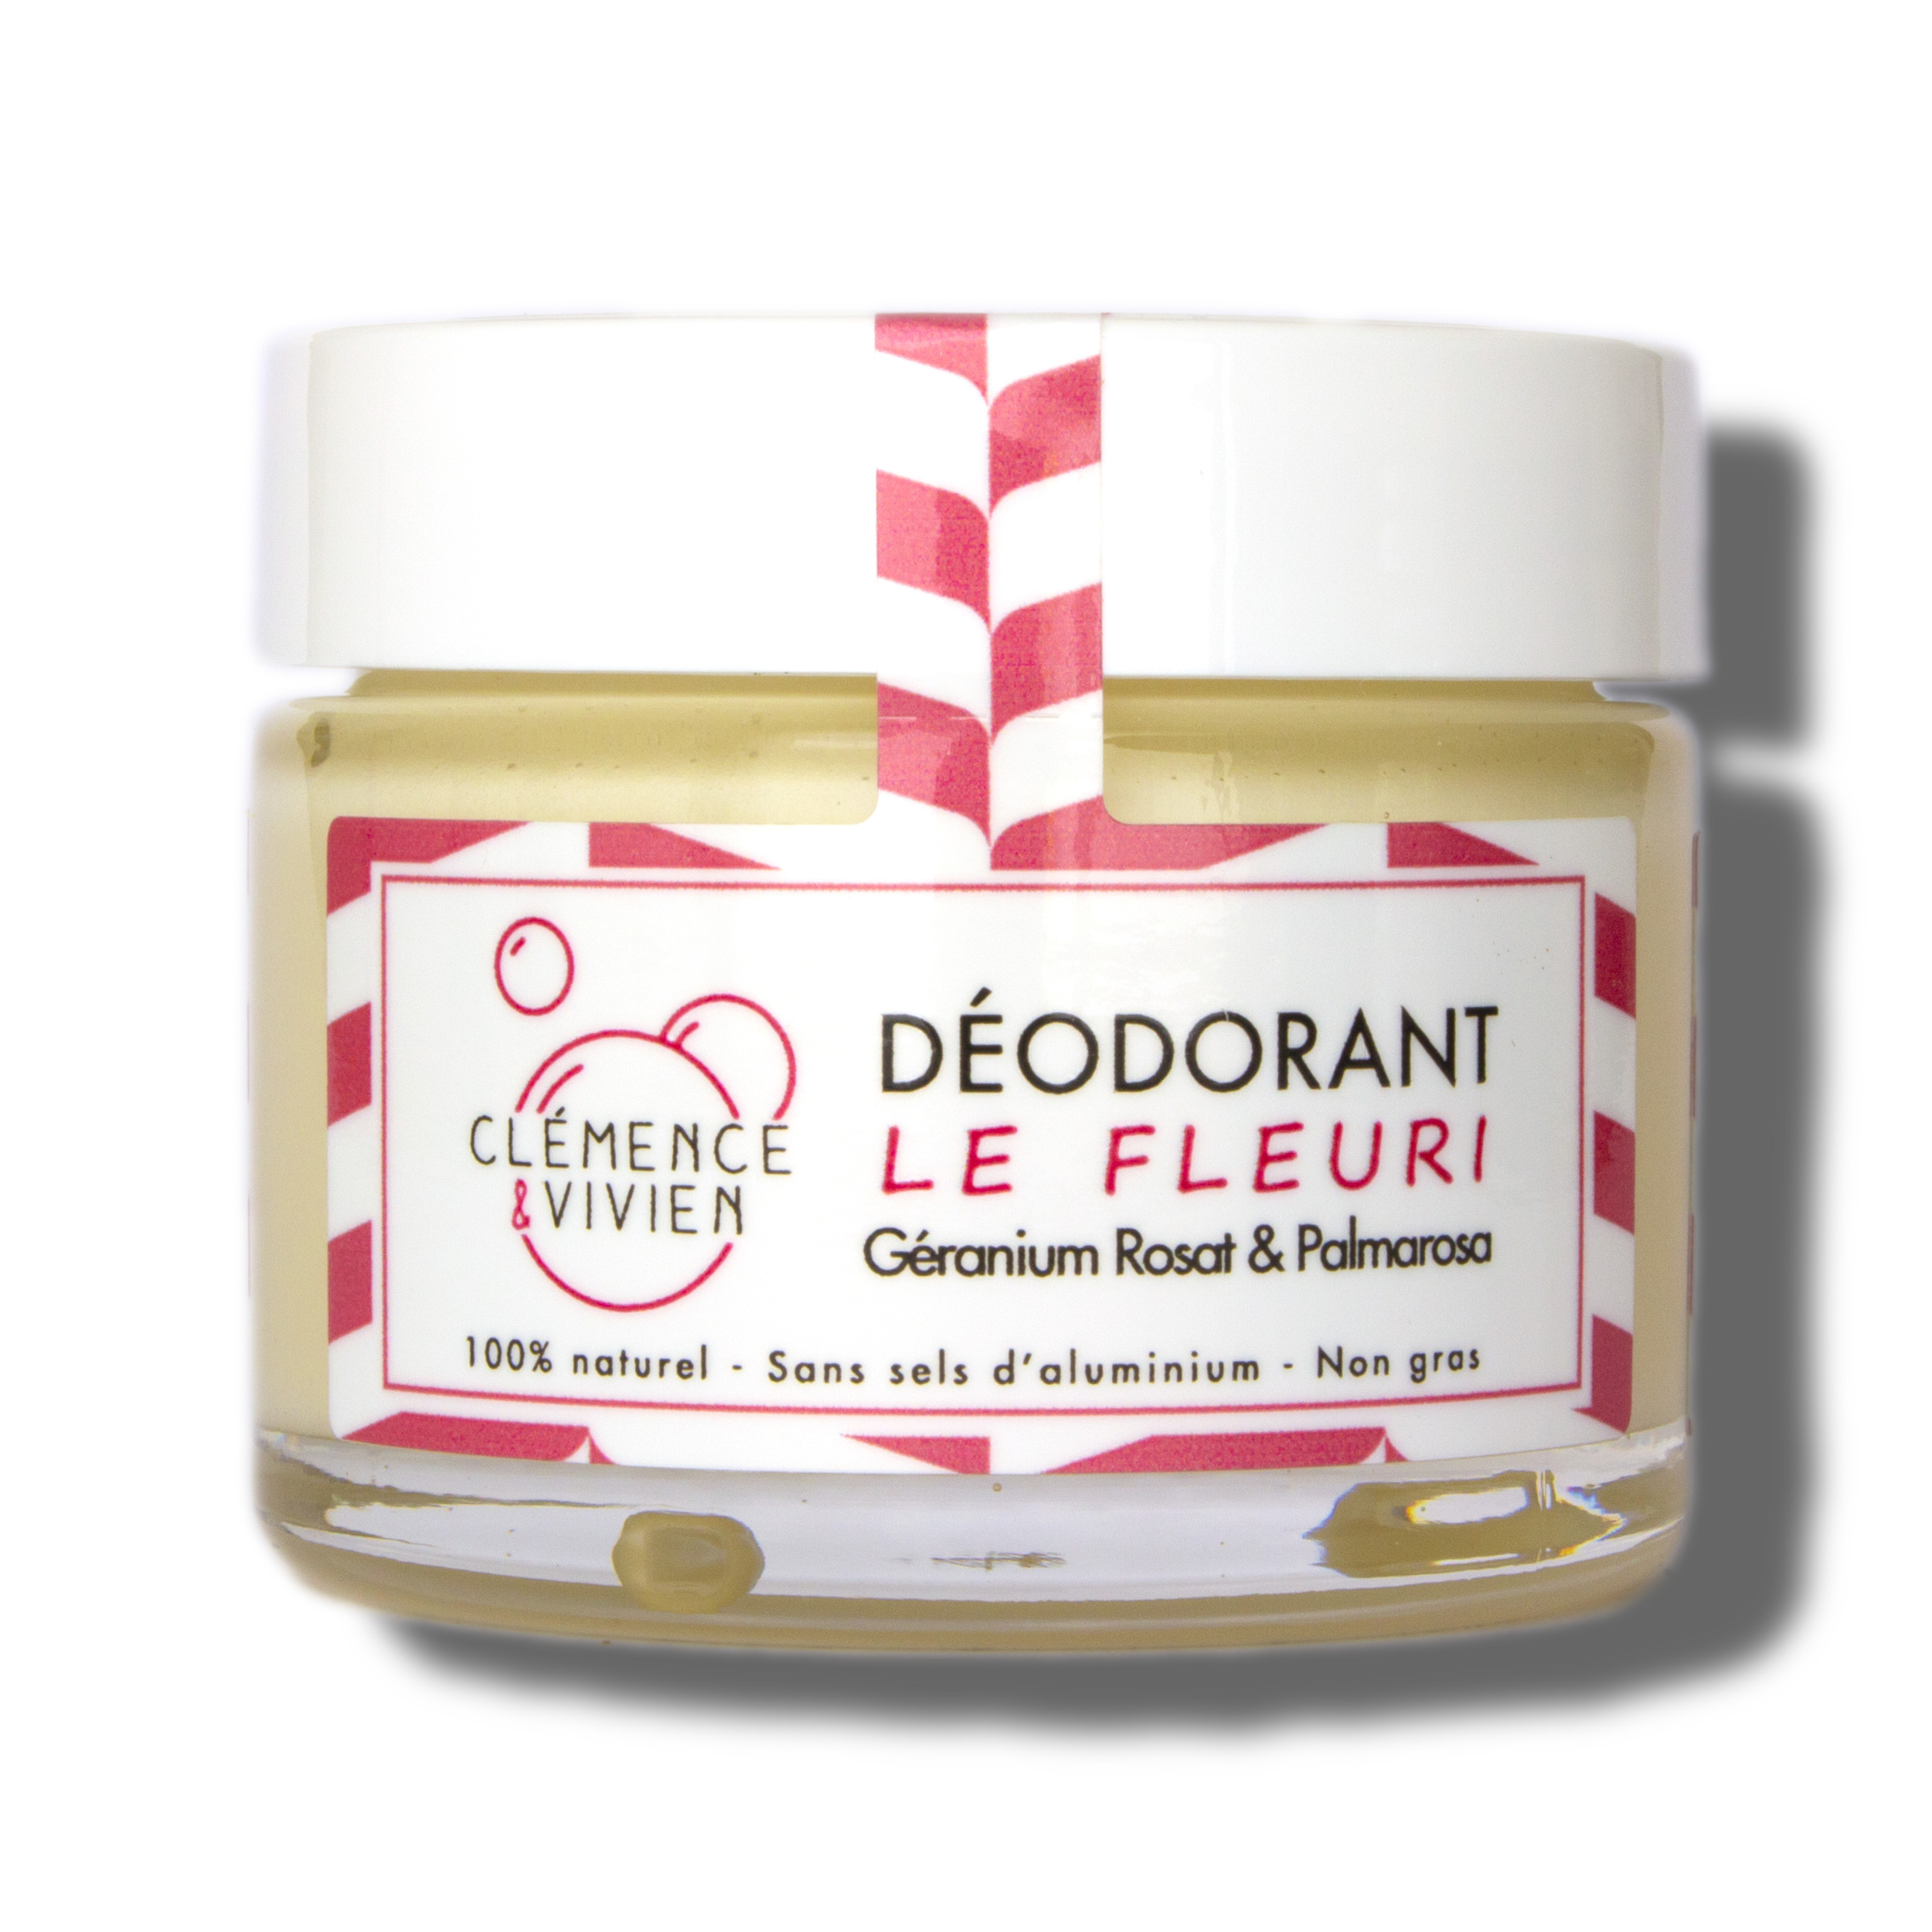 deodorant-fleuri-clemence-et-vivien